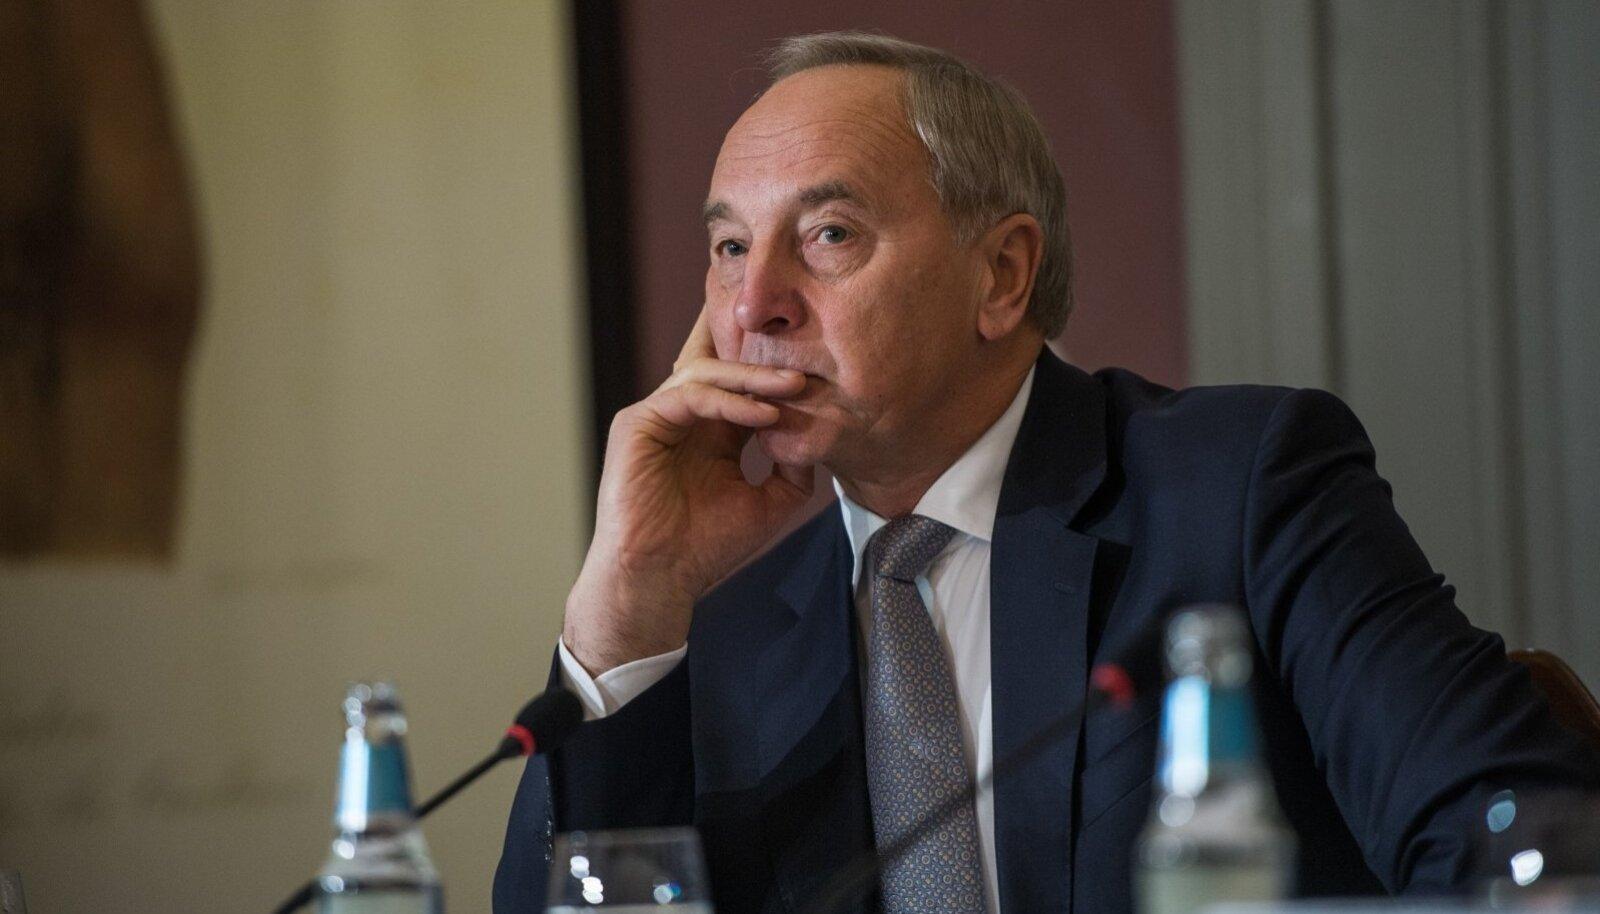 Läti president Andris Bērziņš